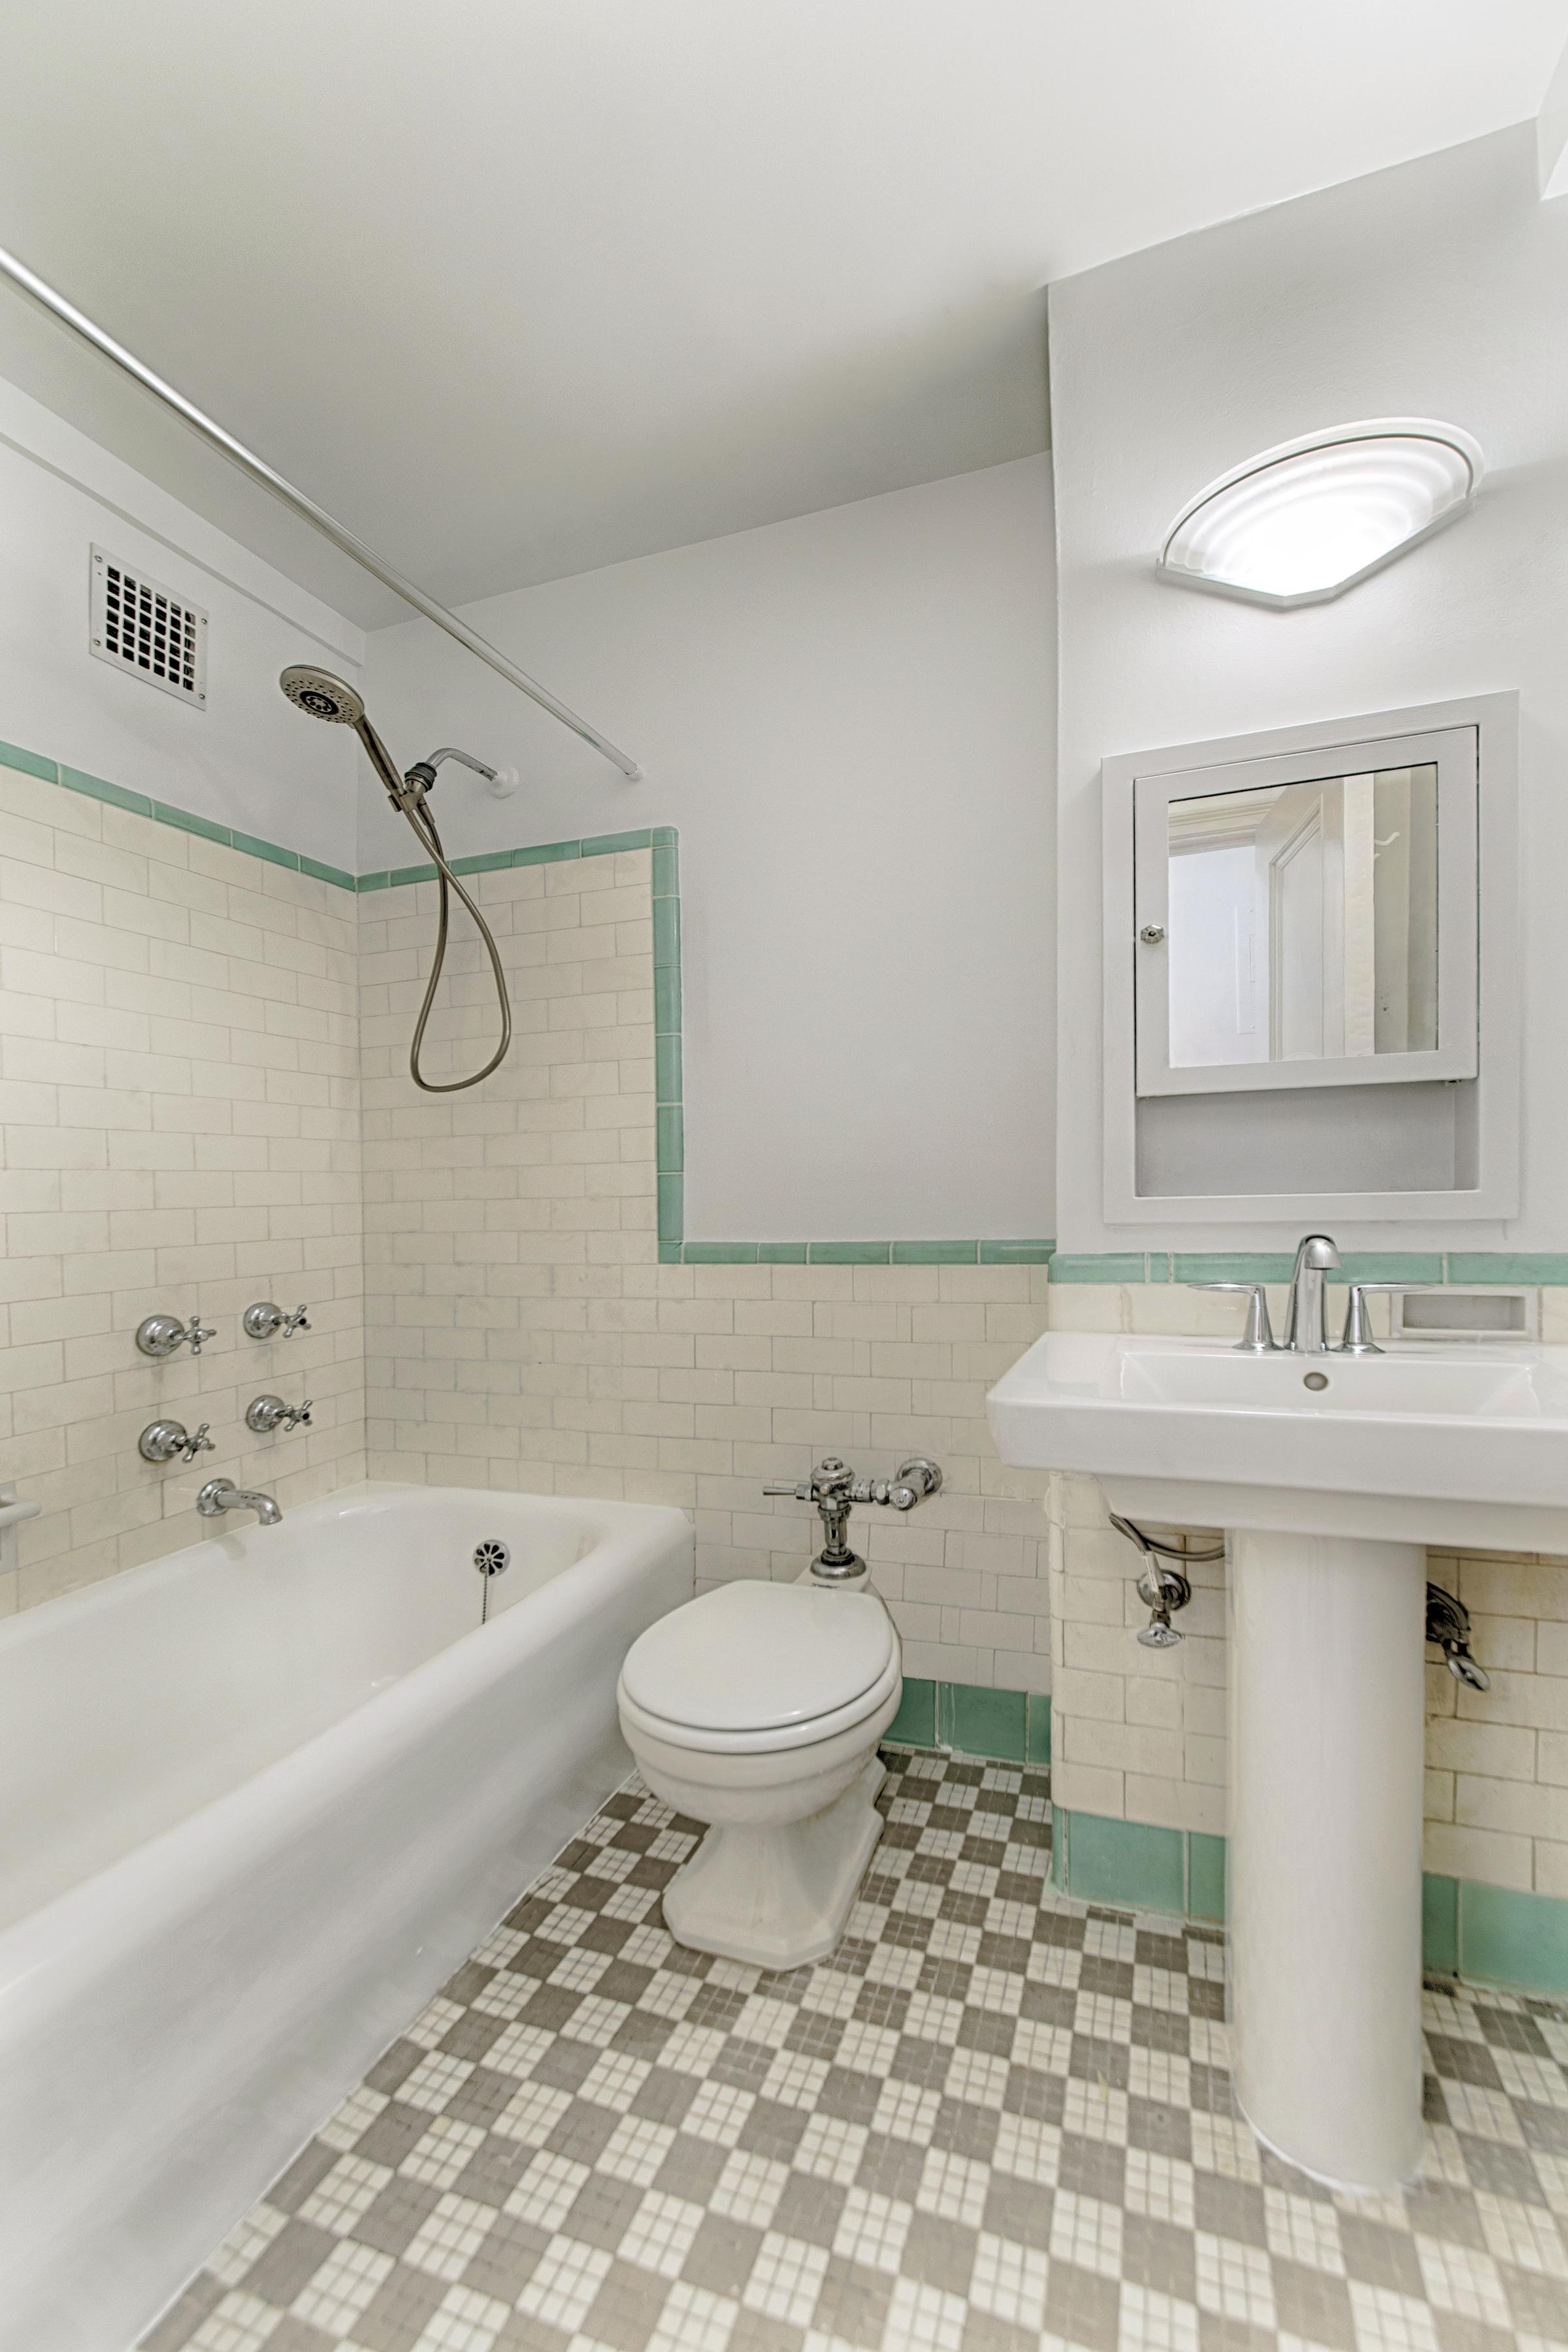 310RSD_1011_bath revised